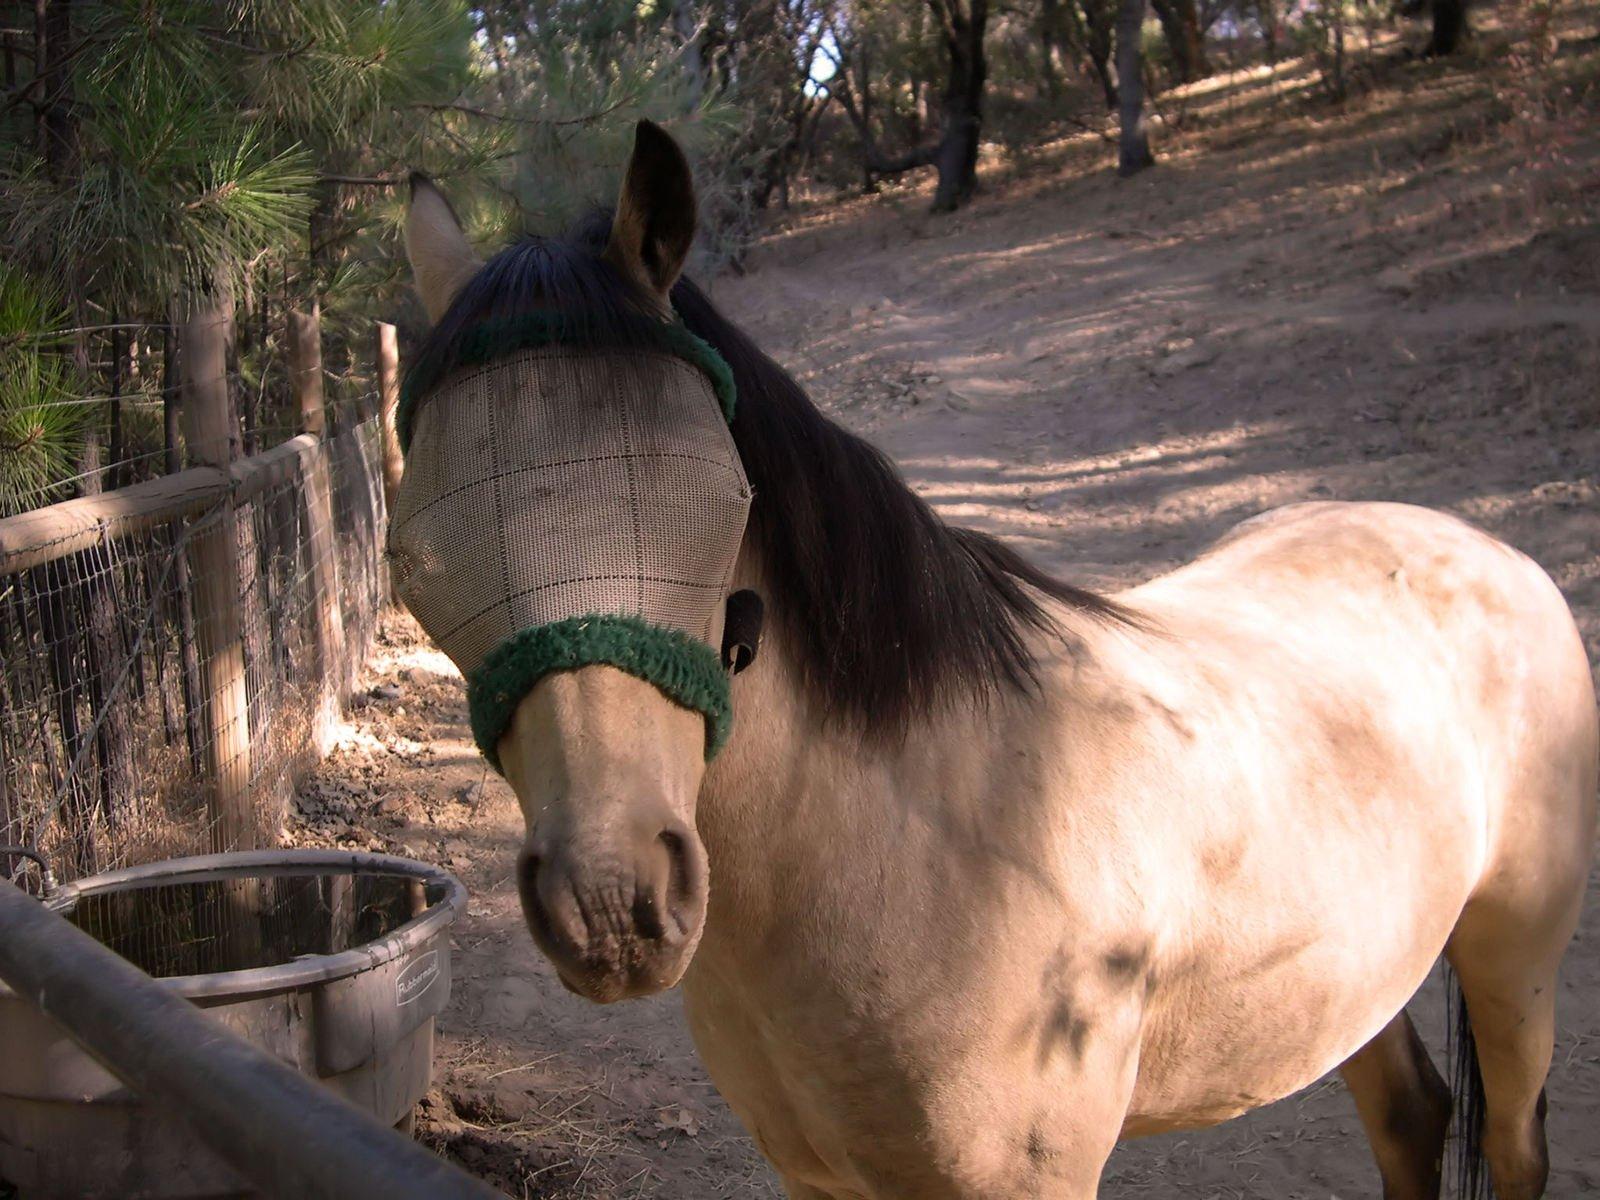 A blindfolded horse